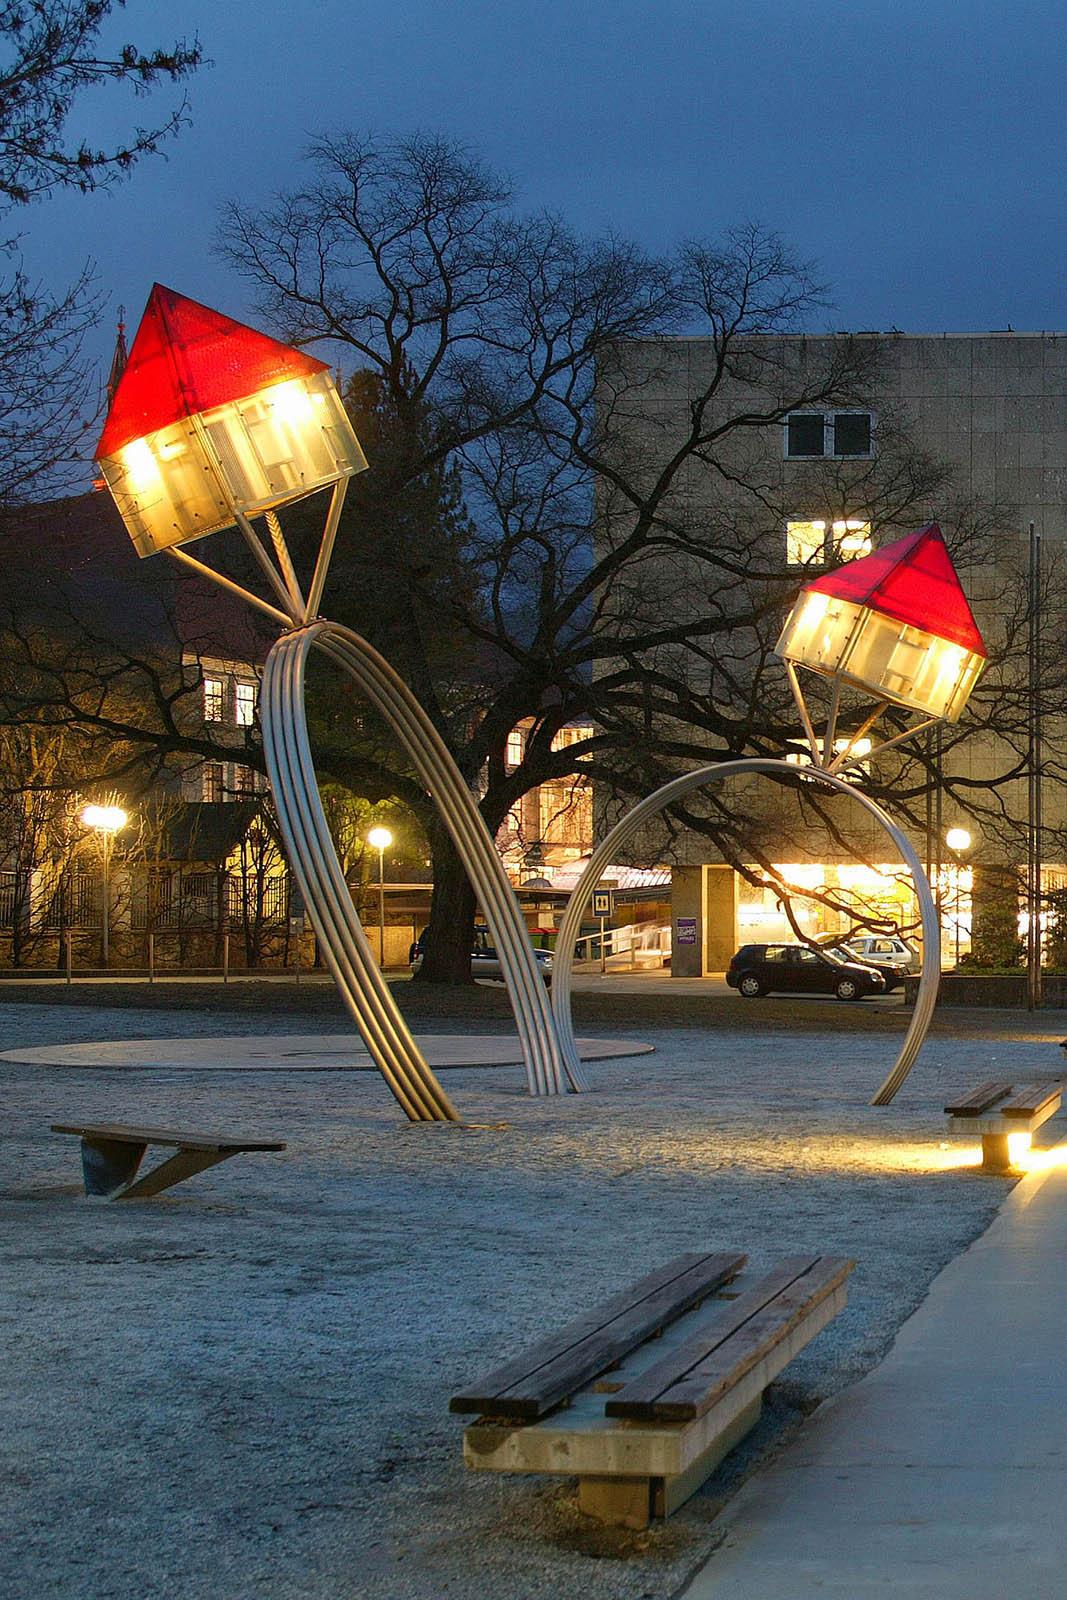 Beleuchtete Oppenheimringe vor dem Leobener Rathaus